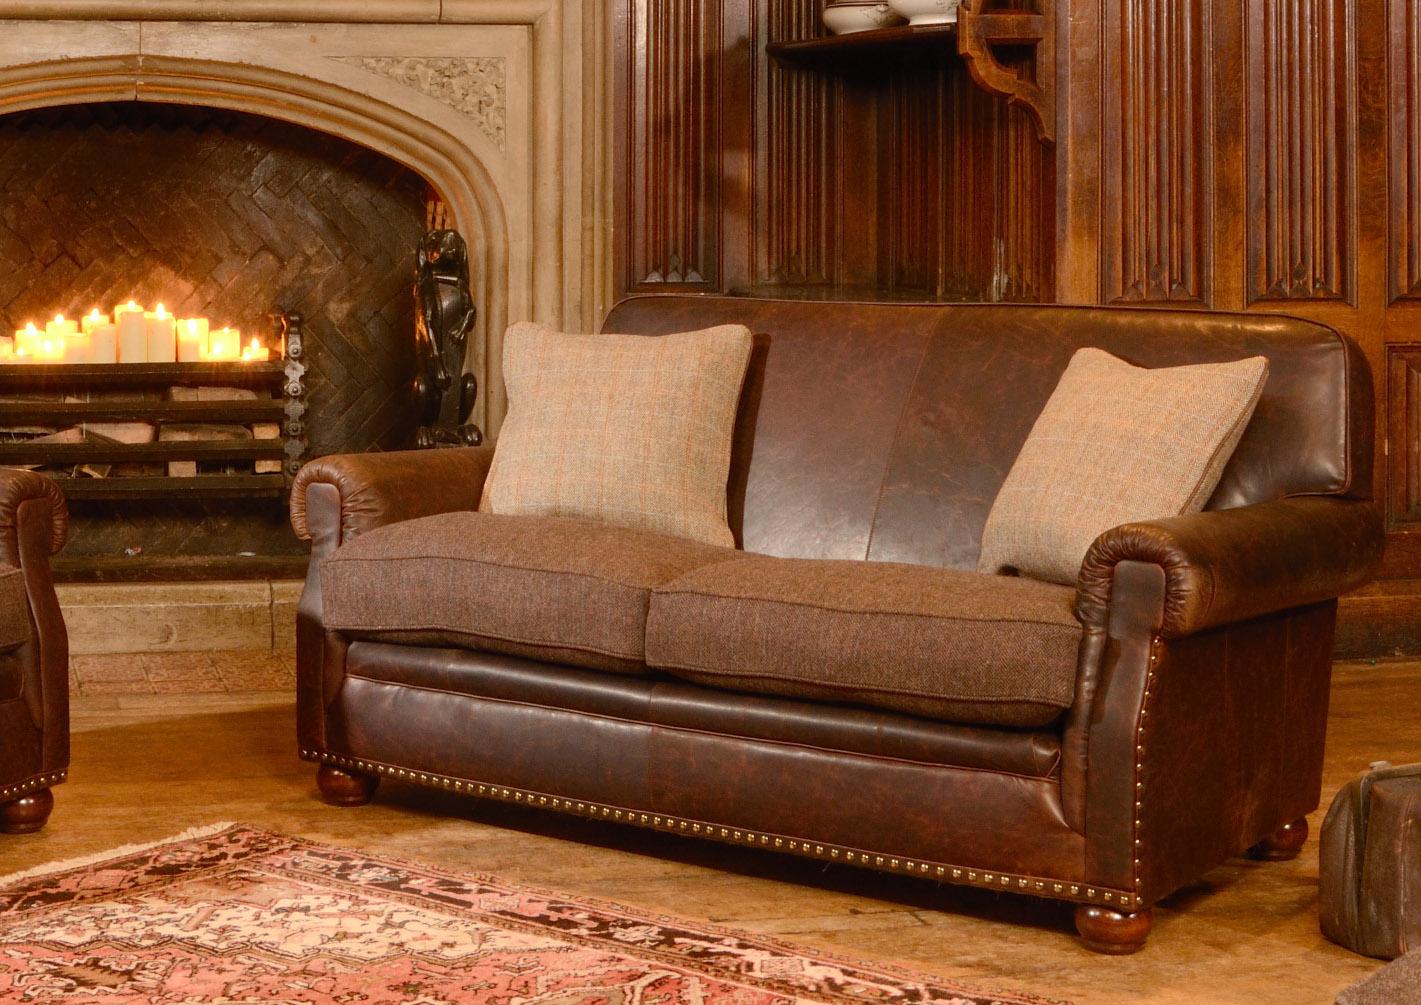 Stornoway tetrad harris tweed handmade furniture for Leather and tweed sofa